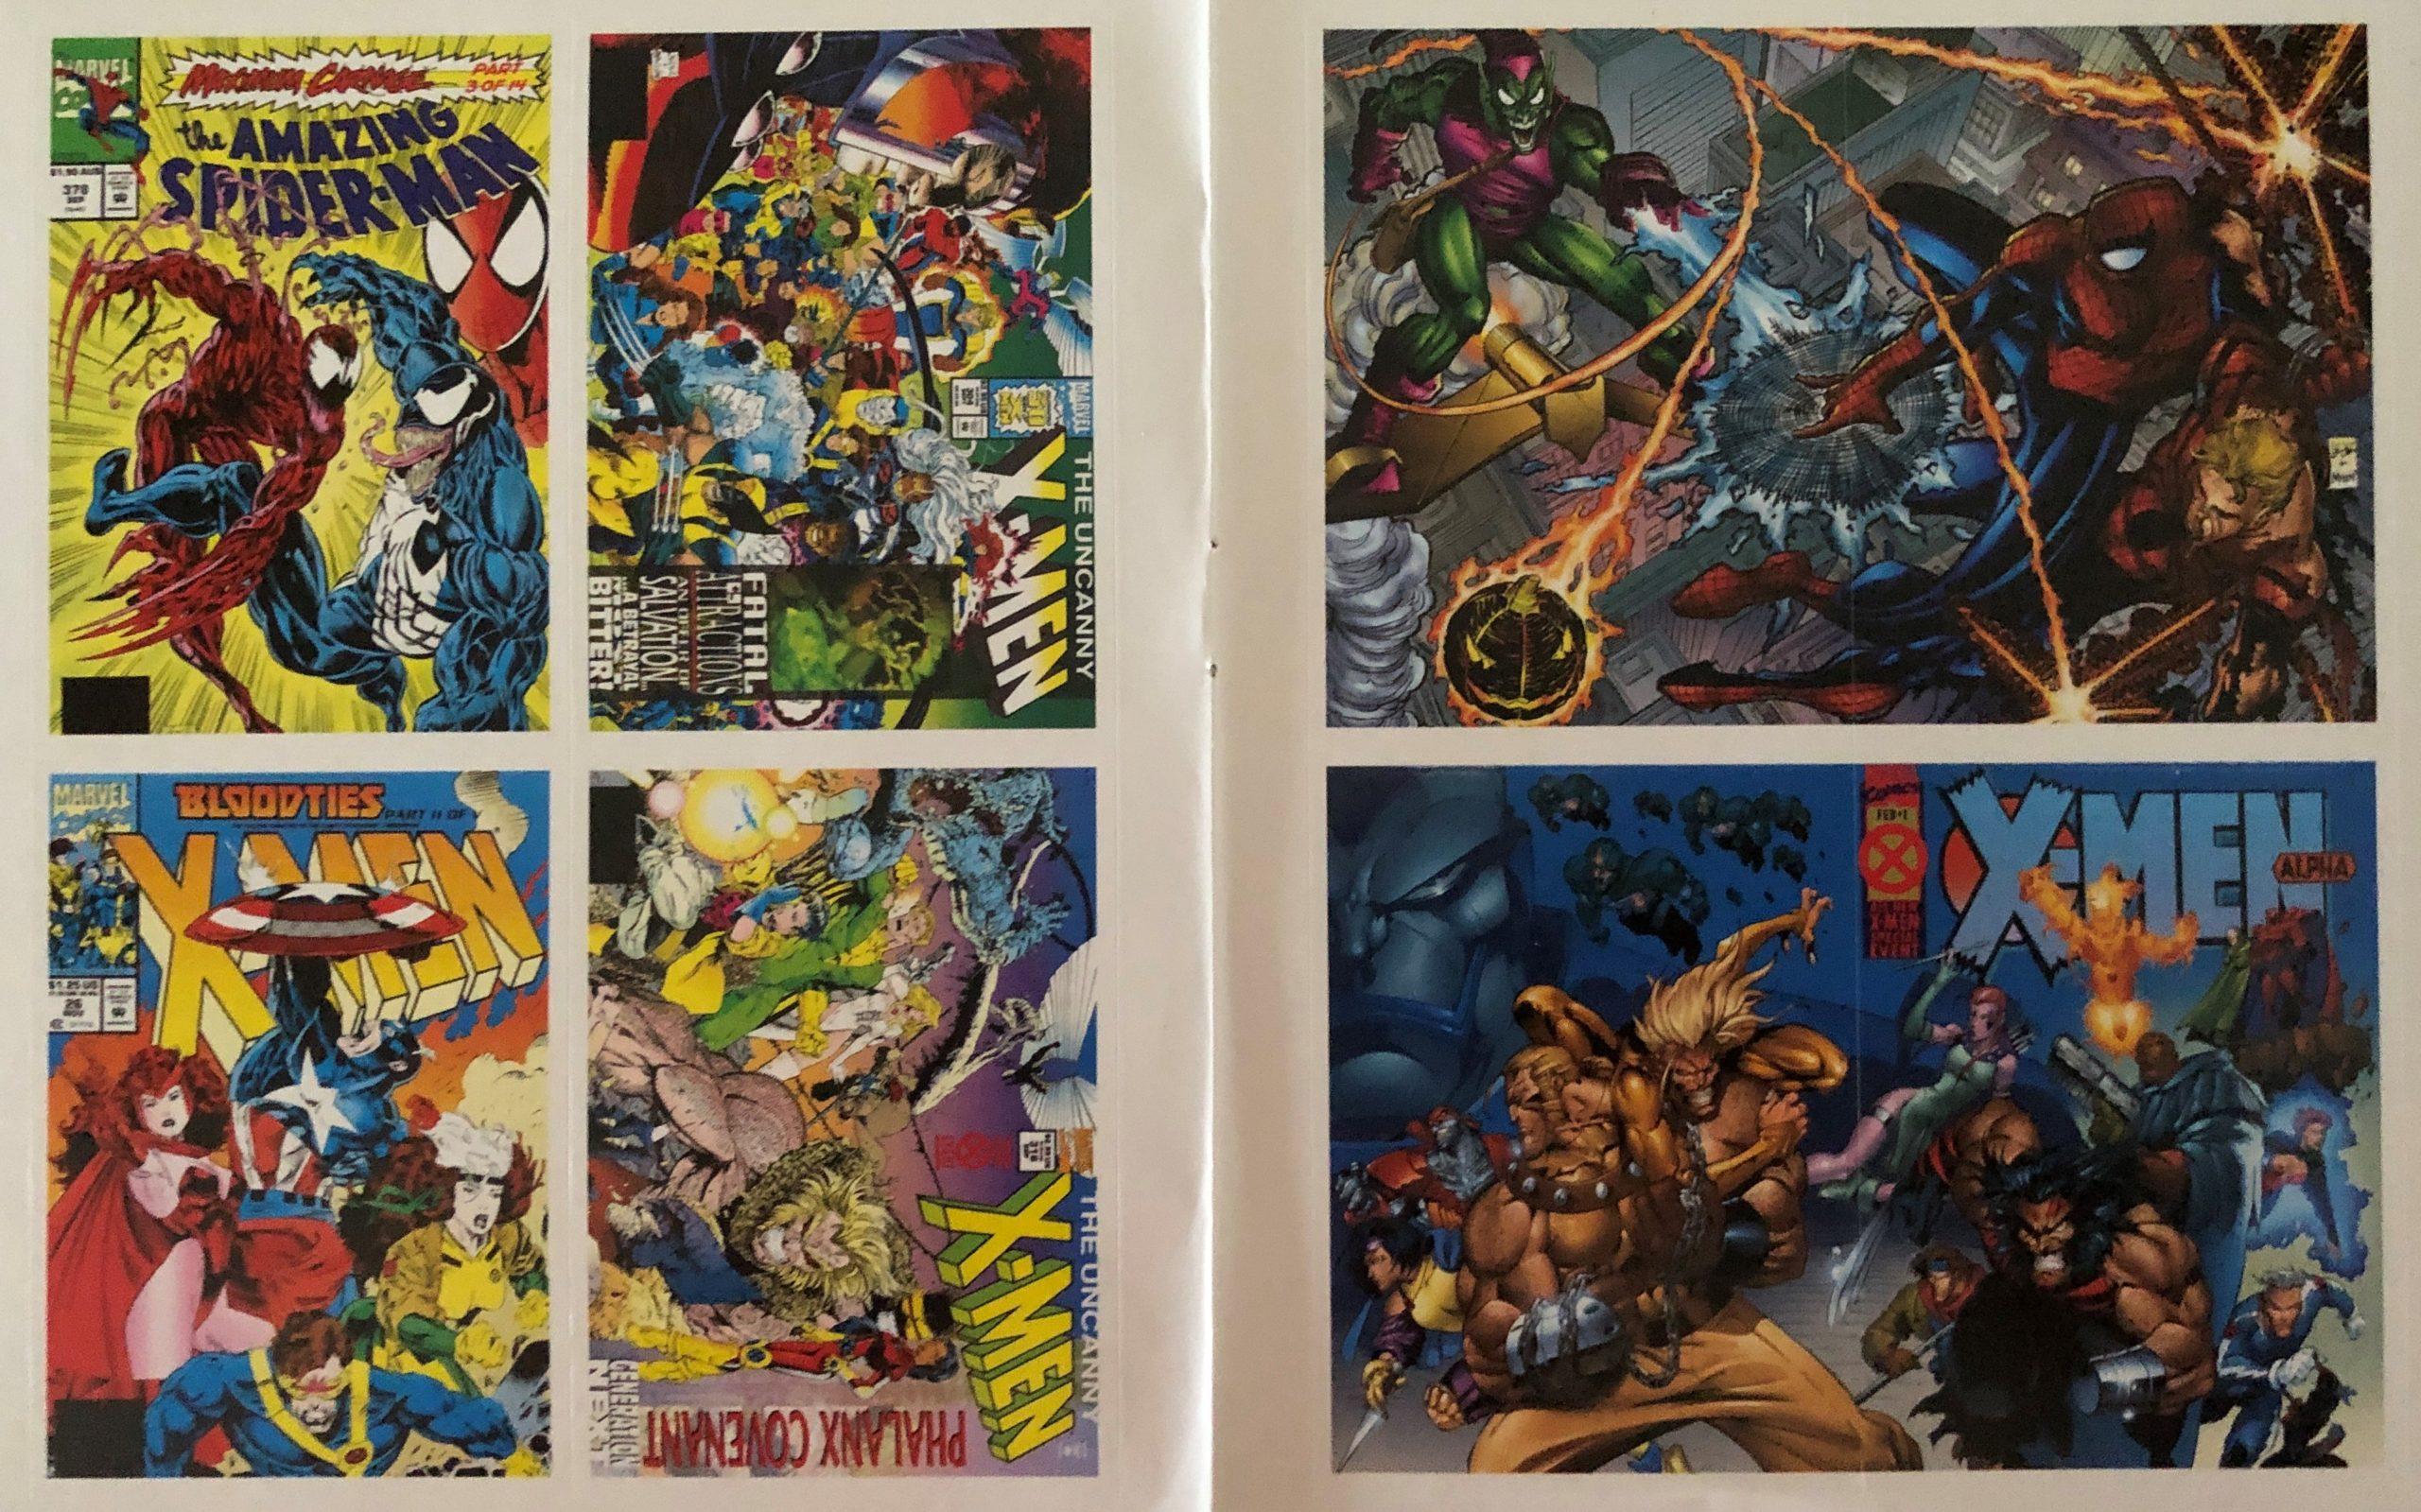 PANINI-Justice League-sammelsticker n x34